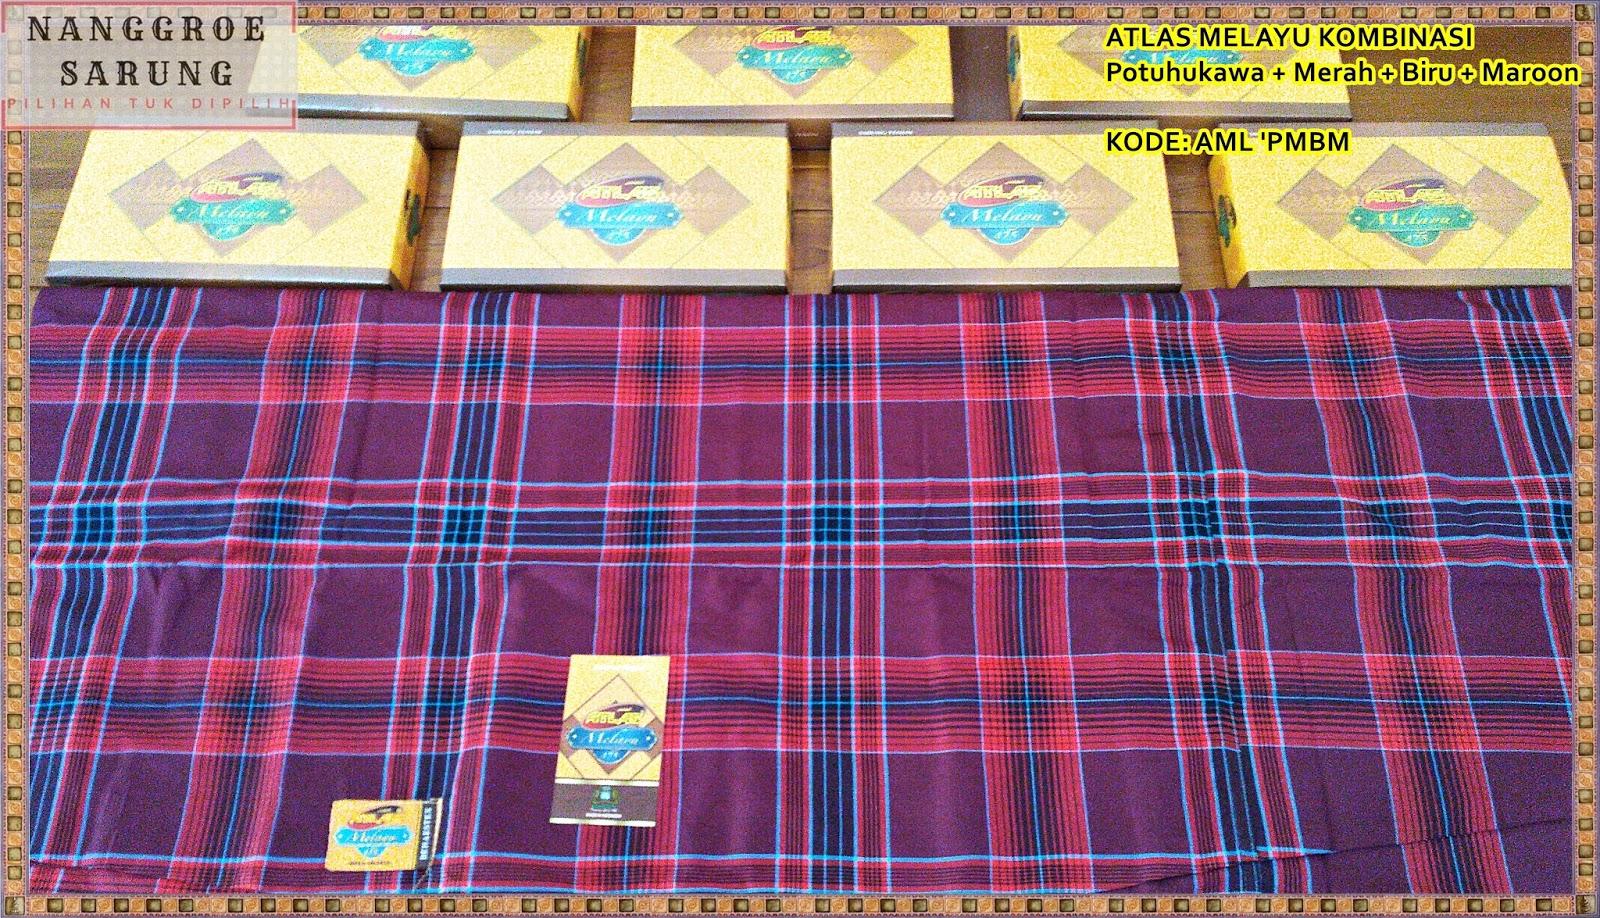 Sarung Atlas Kombinasi Kotak Merah Maroon Best Buy Indonesia Favorit Bata Blanjacom Source 475 Melayu Potuhukawa Biru